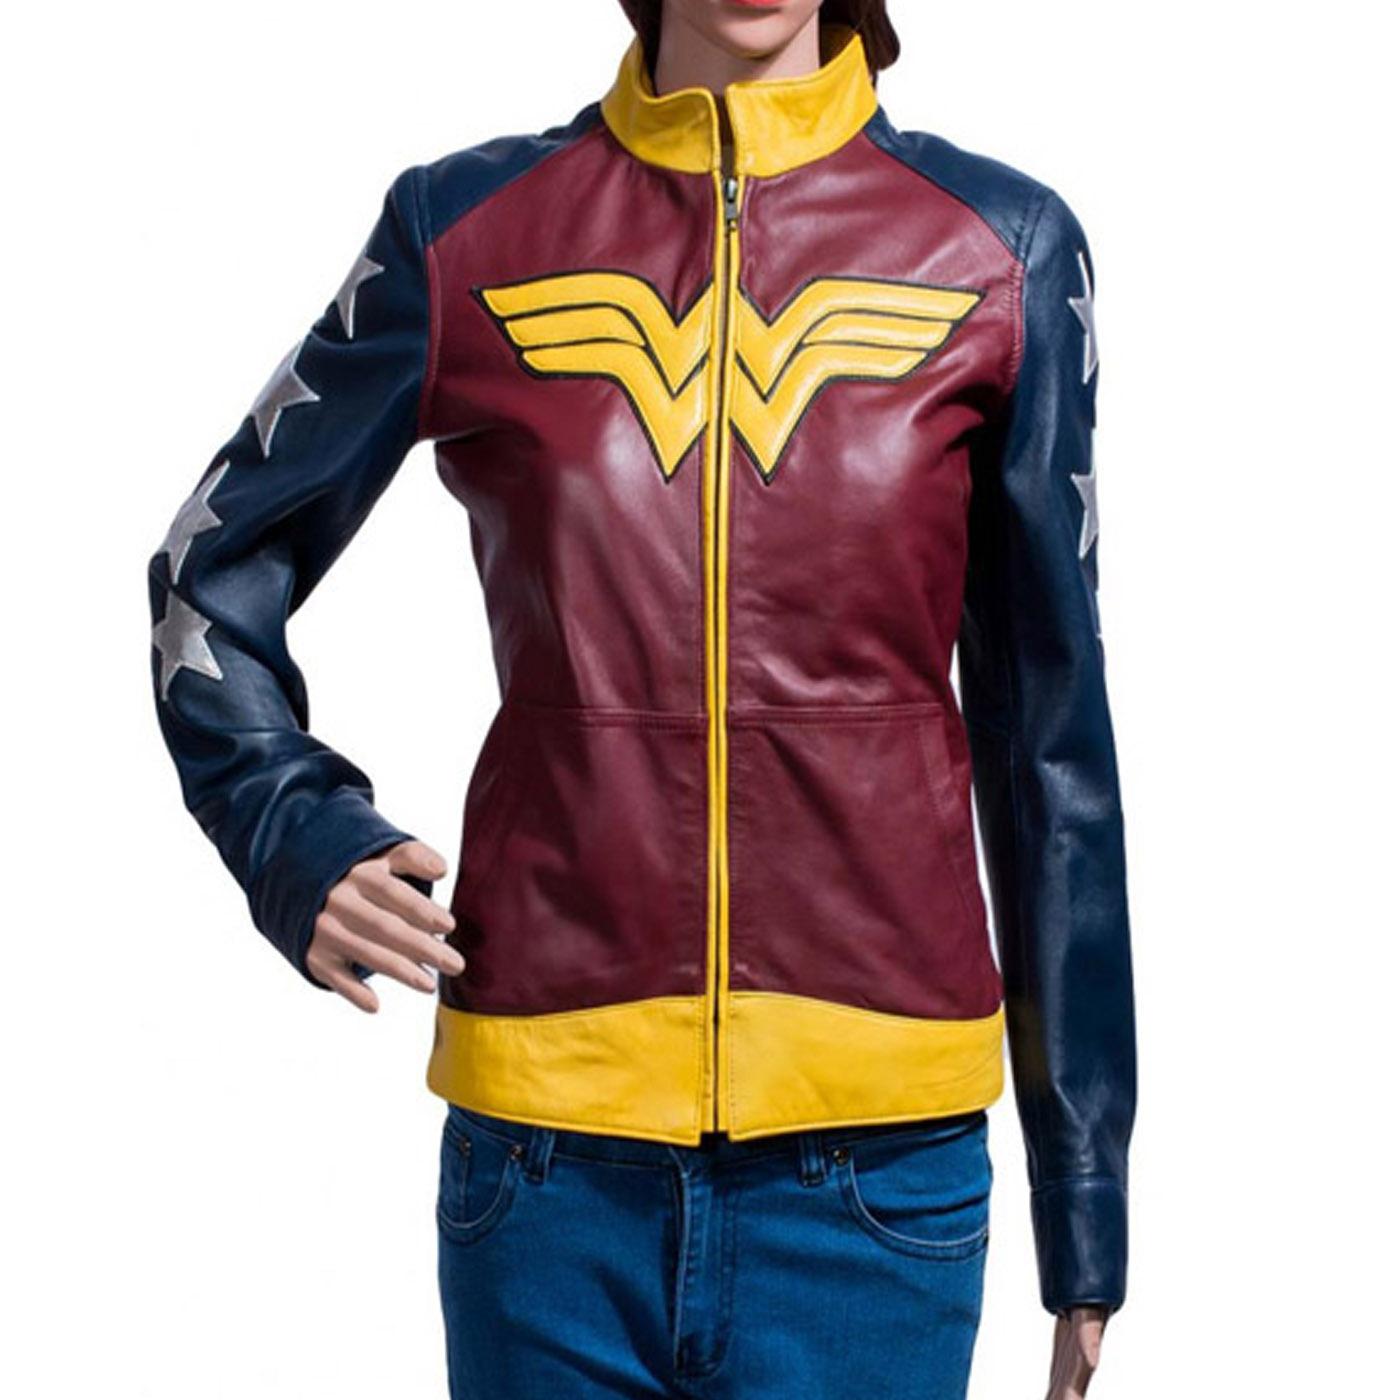 Wonder Woman Leather Jacket.